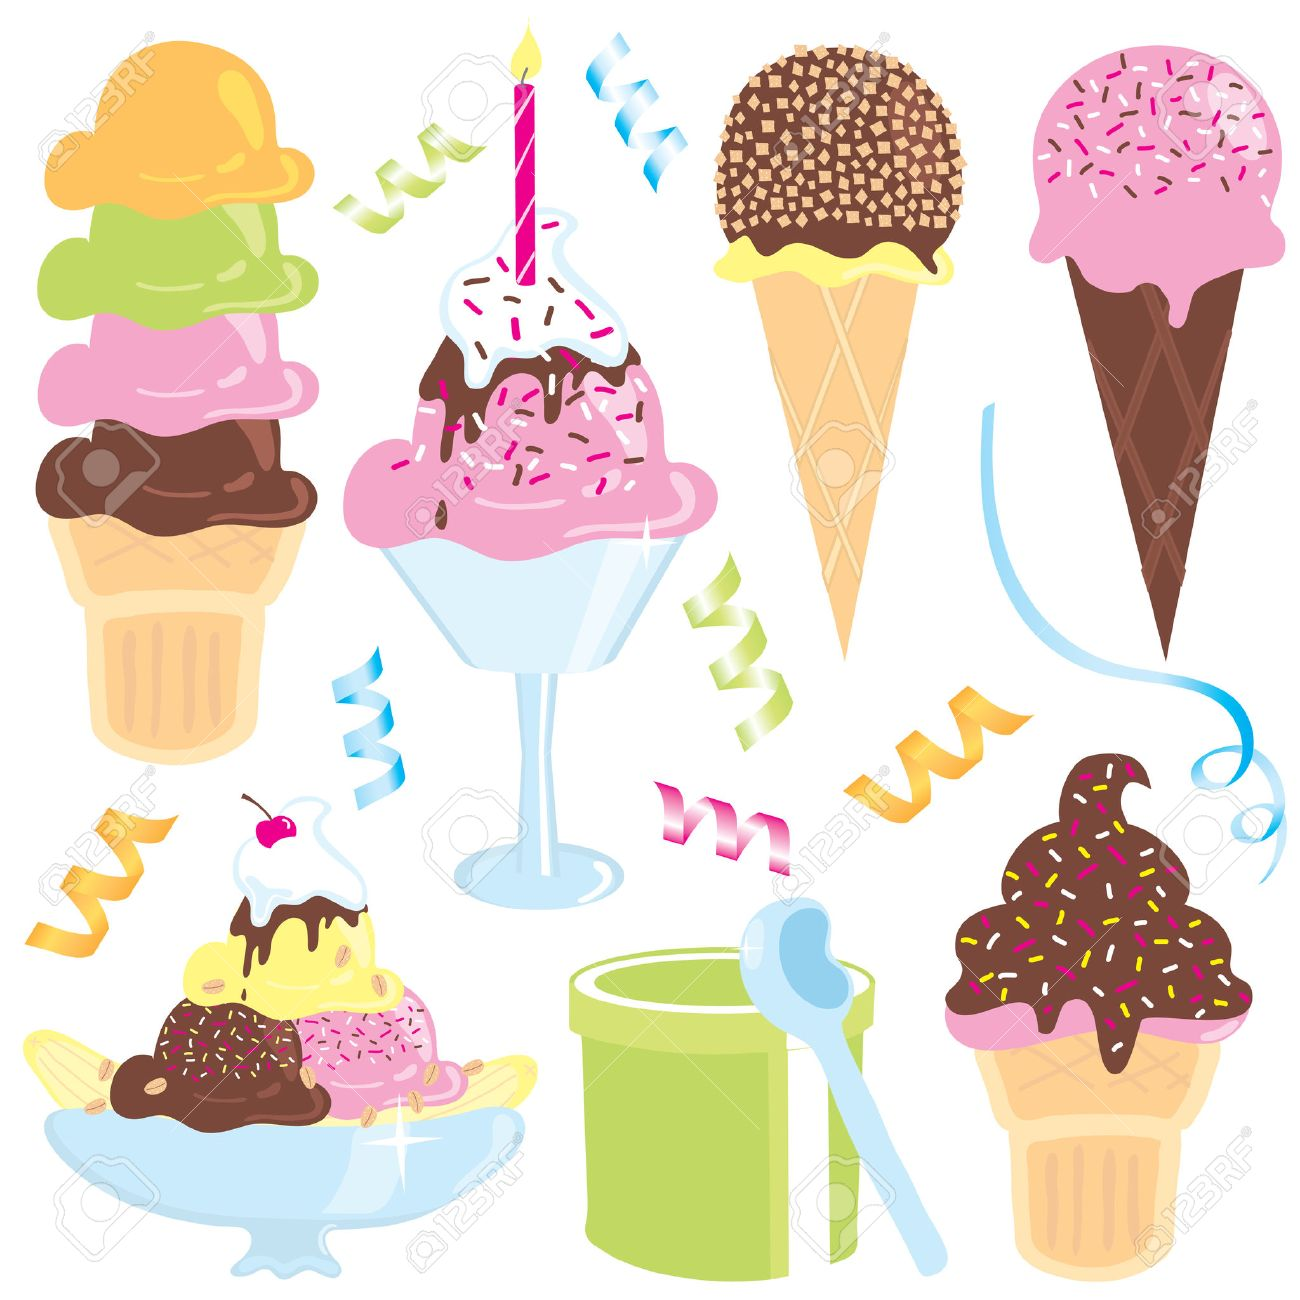 ice cream sundae, banana split, cones, streamers and confetti Stock Vector - 4491520